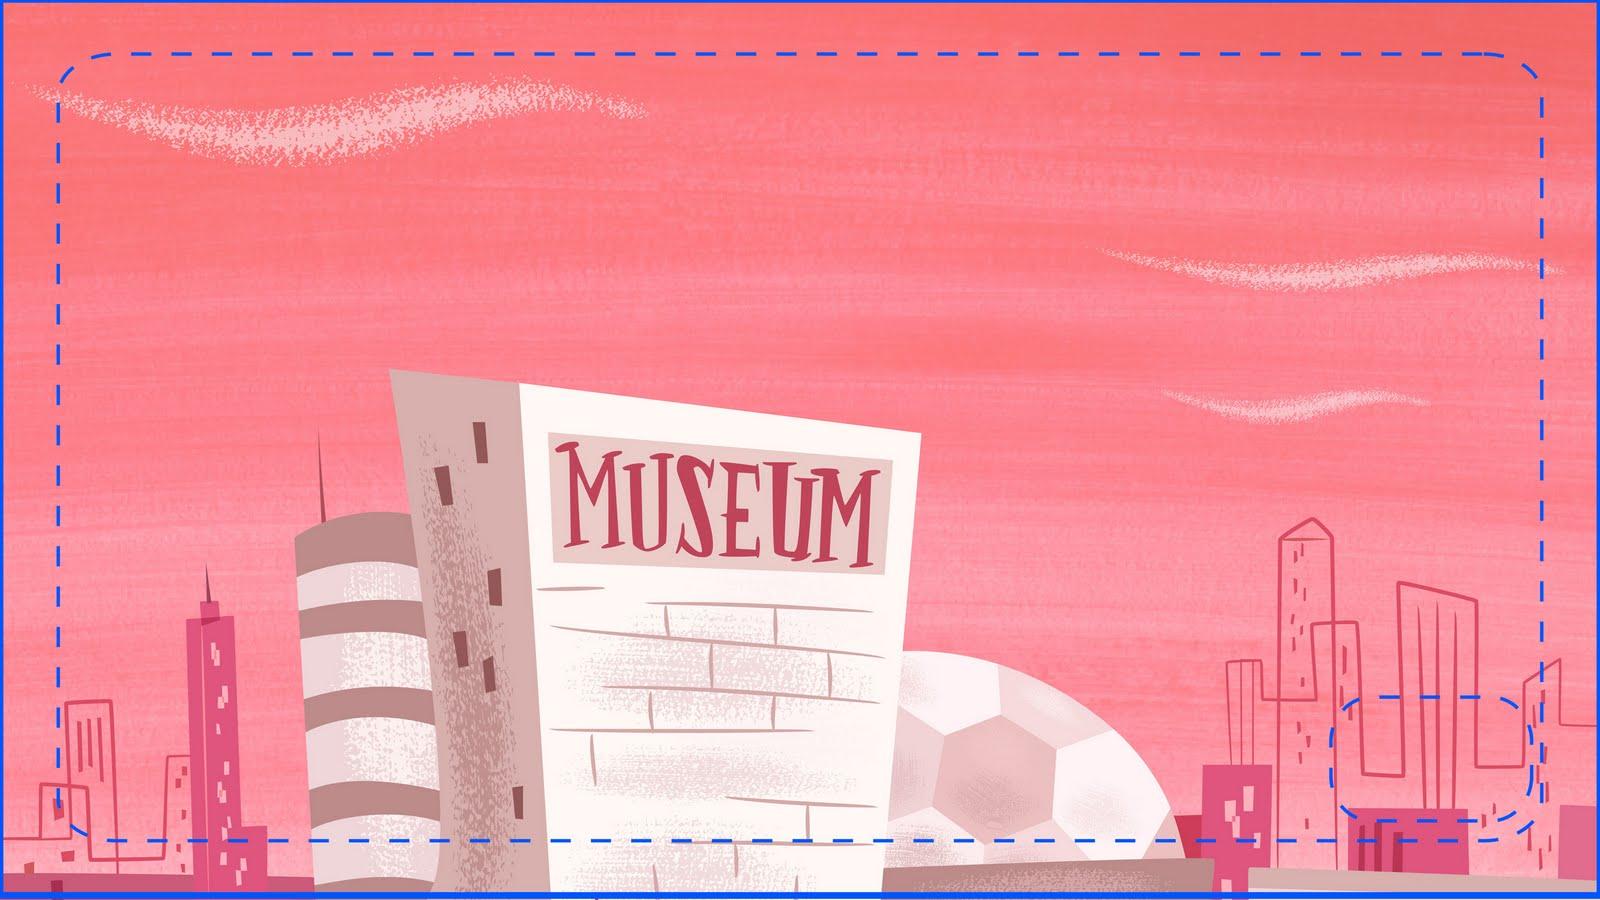 Powerpuff Girls Bedroom Showing Post Media For Cartoon Museum Background Www